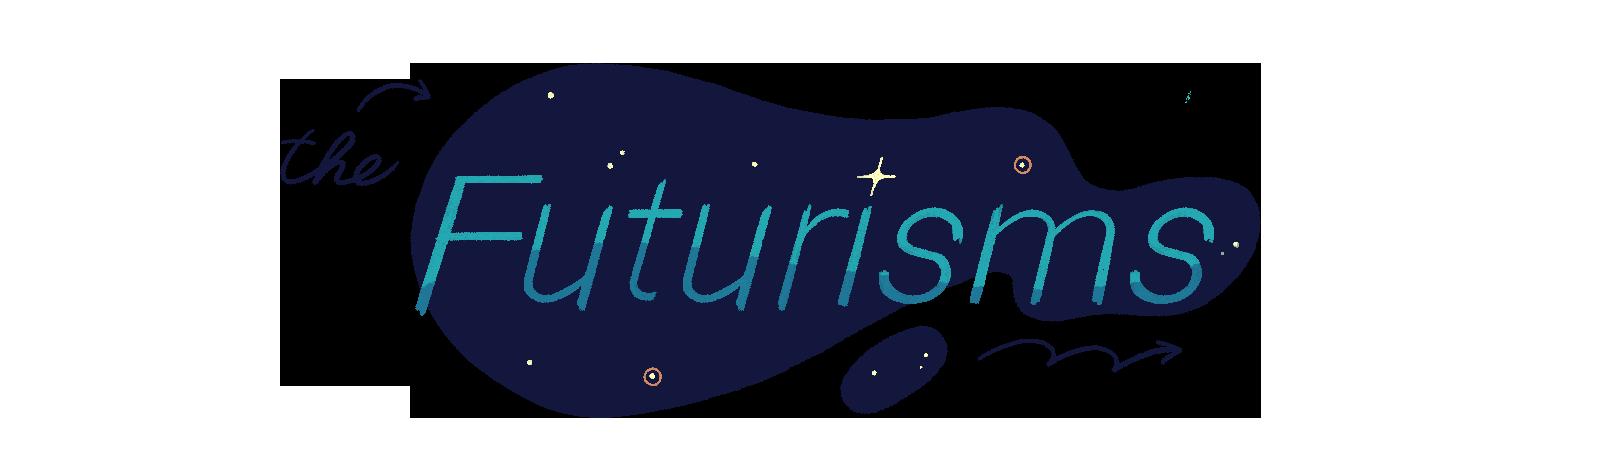 Illustration of the word 'futurisms'